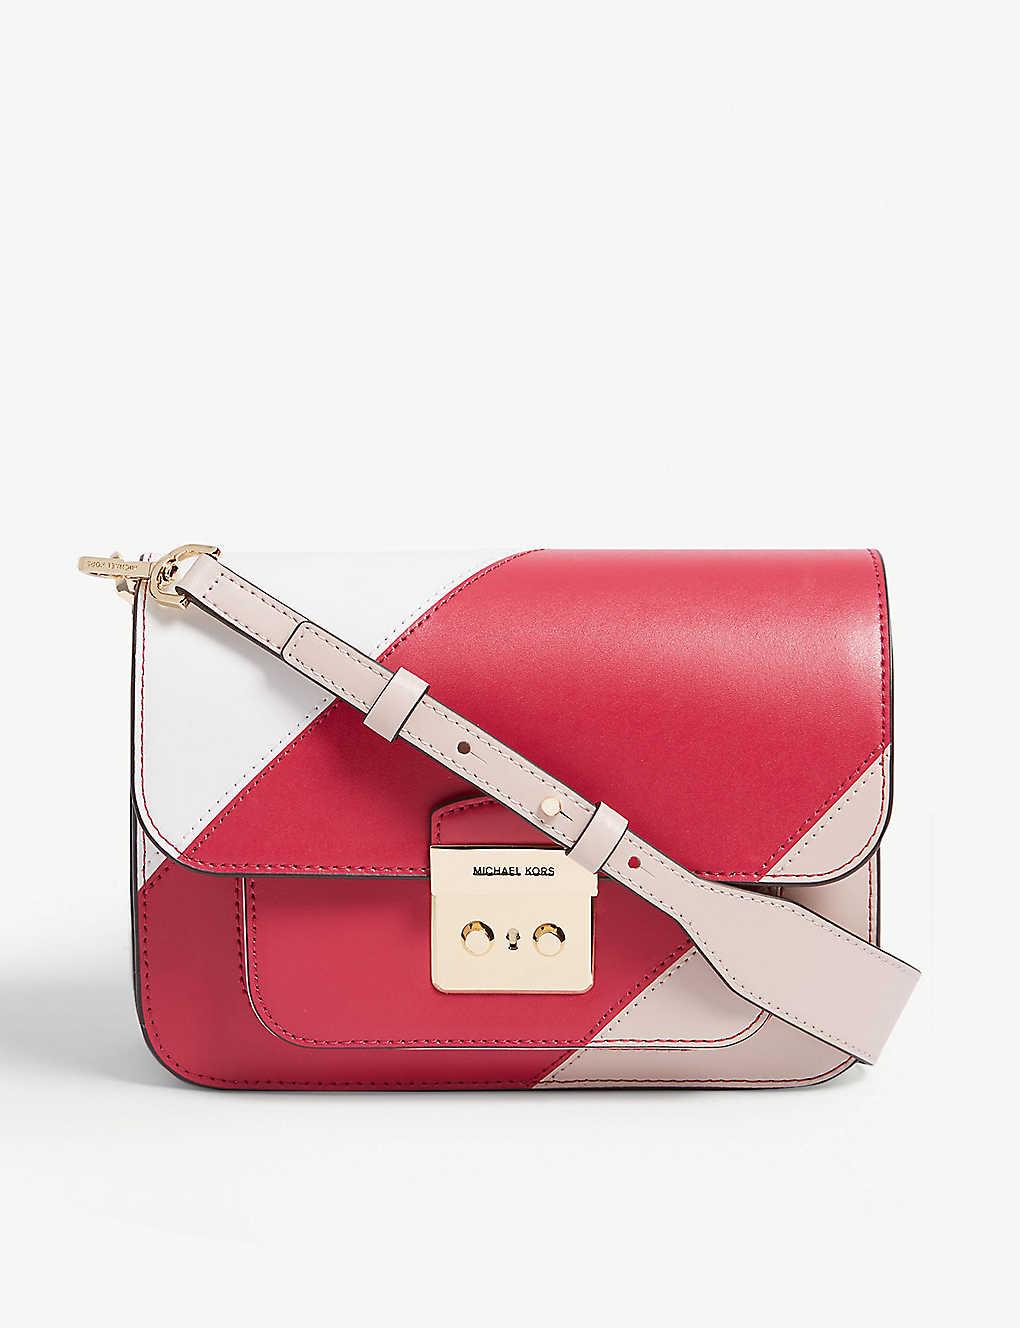 ad226cf3eb81 MICHAEL MICHAEL KORS - Sloan Editor leather shoulder bag ...